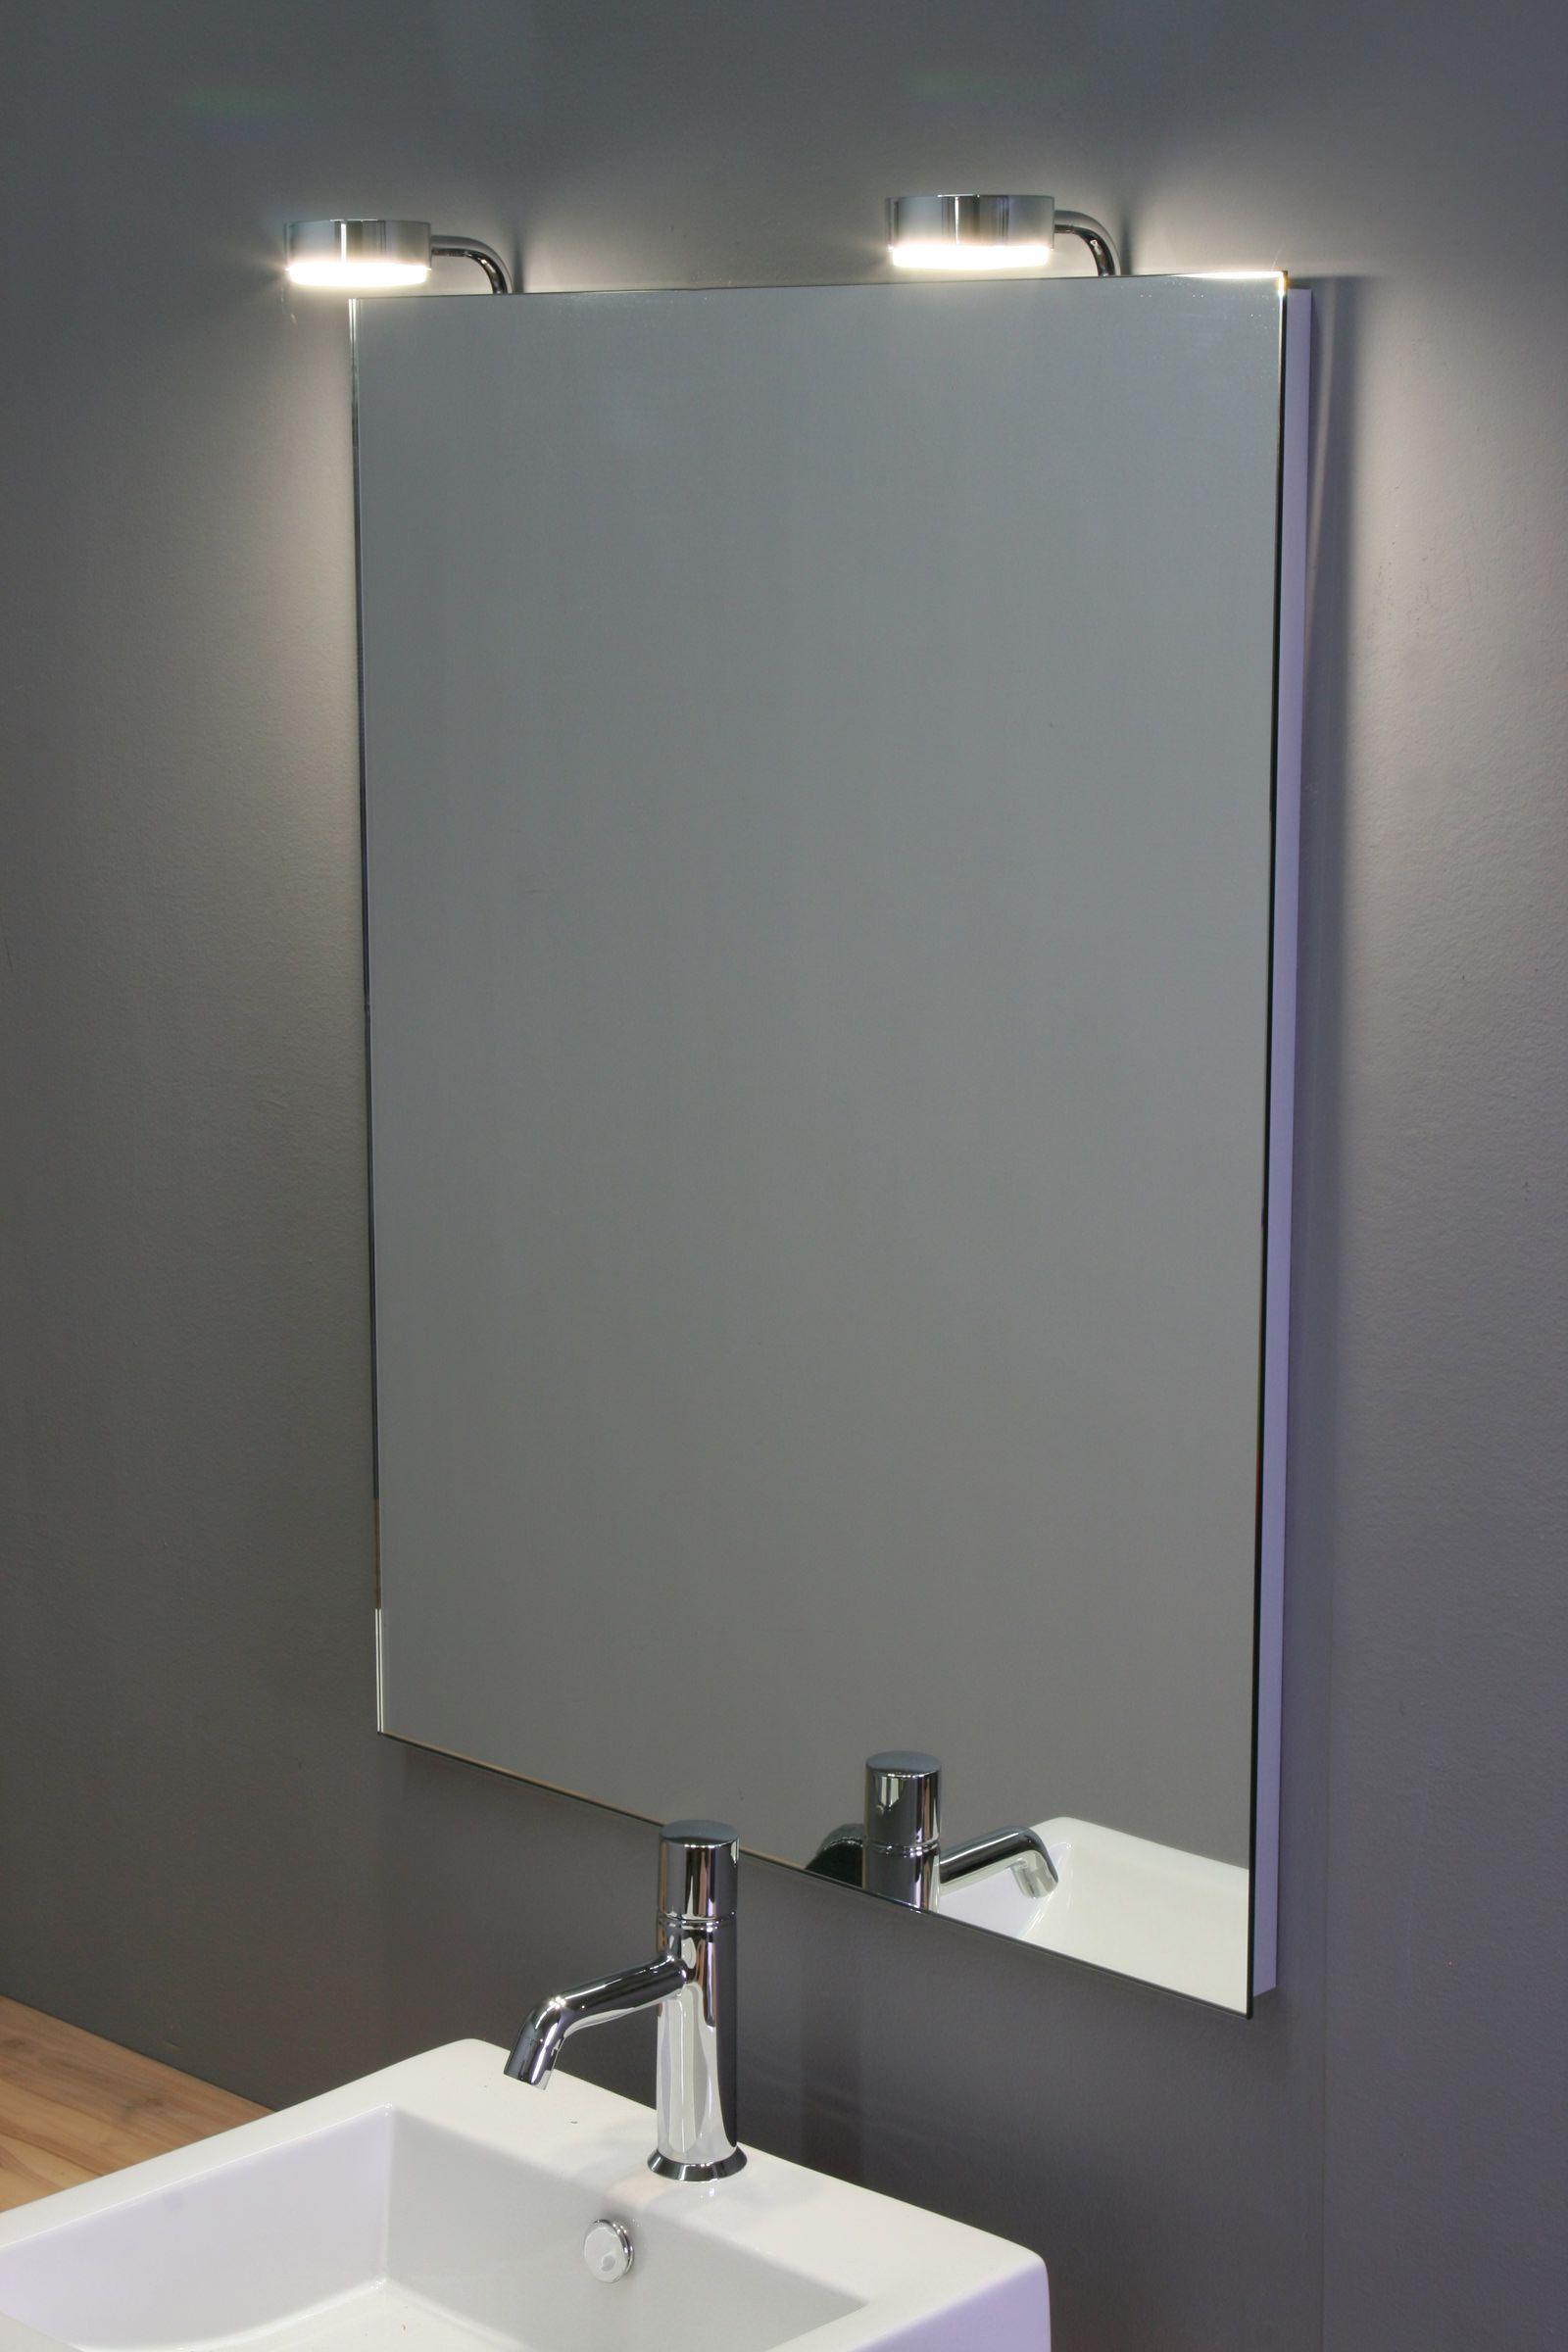 Led Spiegel Leuchte Dribb Kristallspiegel Basic Runde Spiegelleuchte Led Spiegel Badezimmer Led Lampen Bad